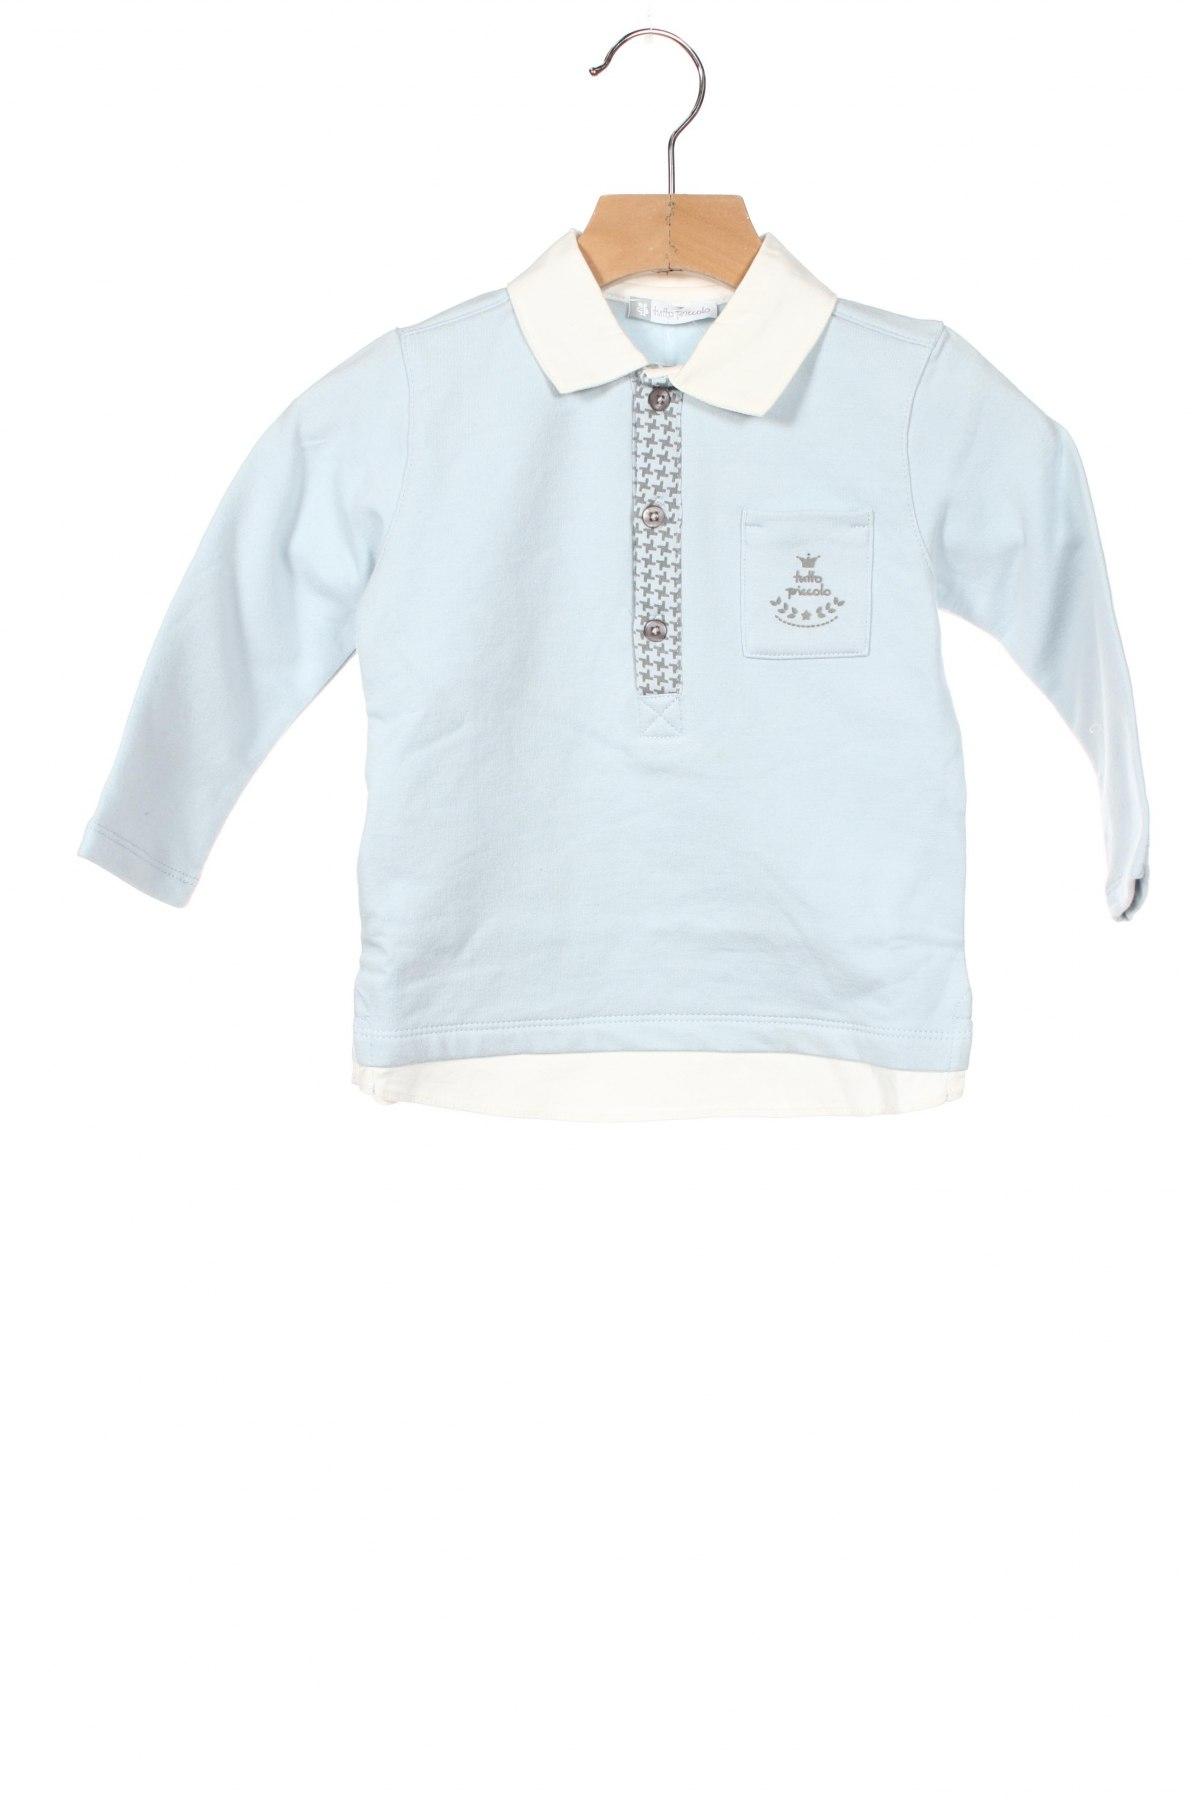 Детска блуза Tutto Piccolo, Размер 18-24m/ 86-98 см, Цвят Син, 95% памук, 5% еластан, Цена 26,60лв.